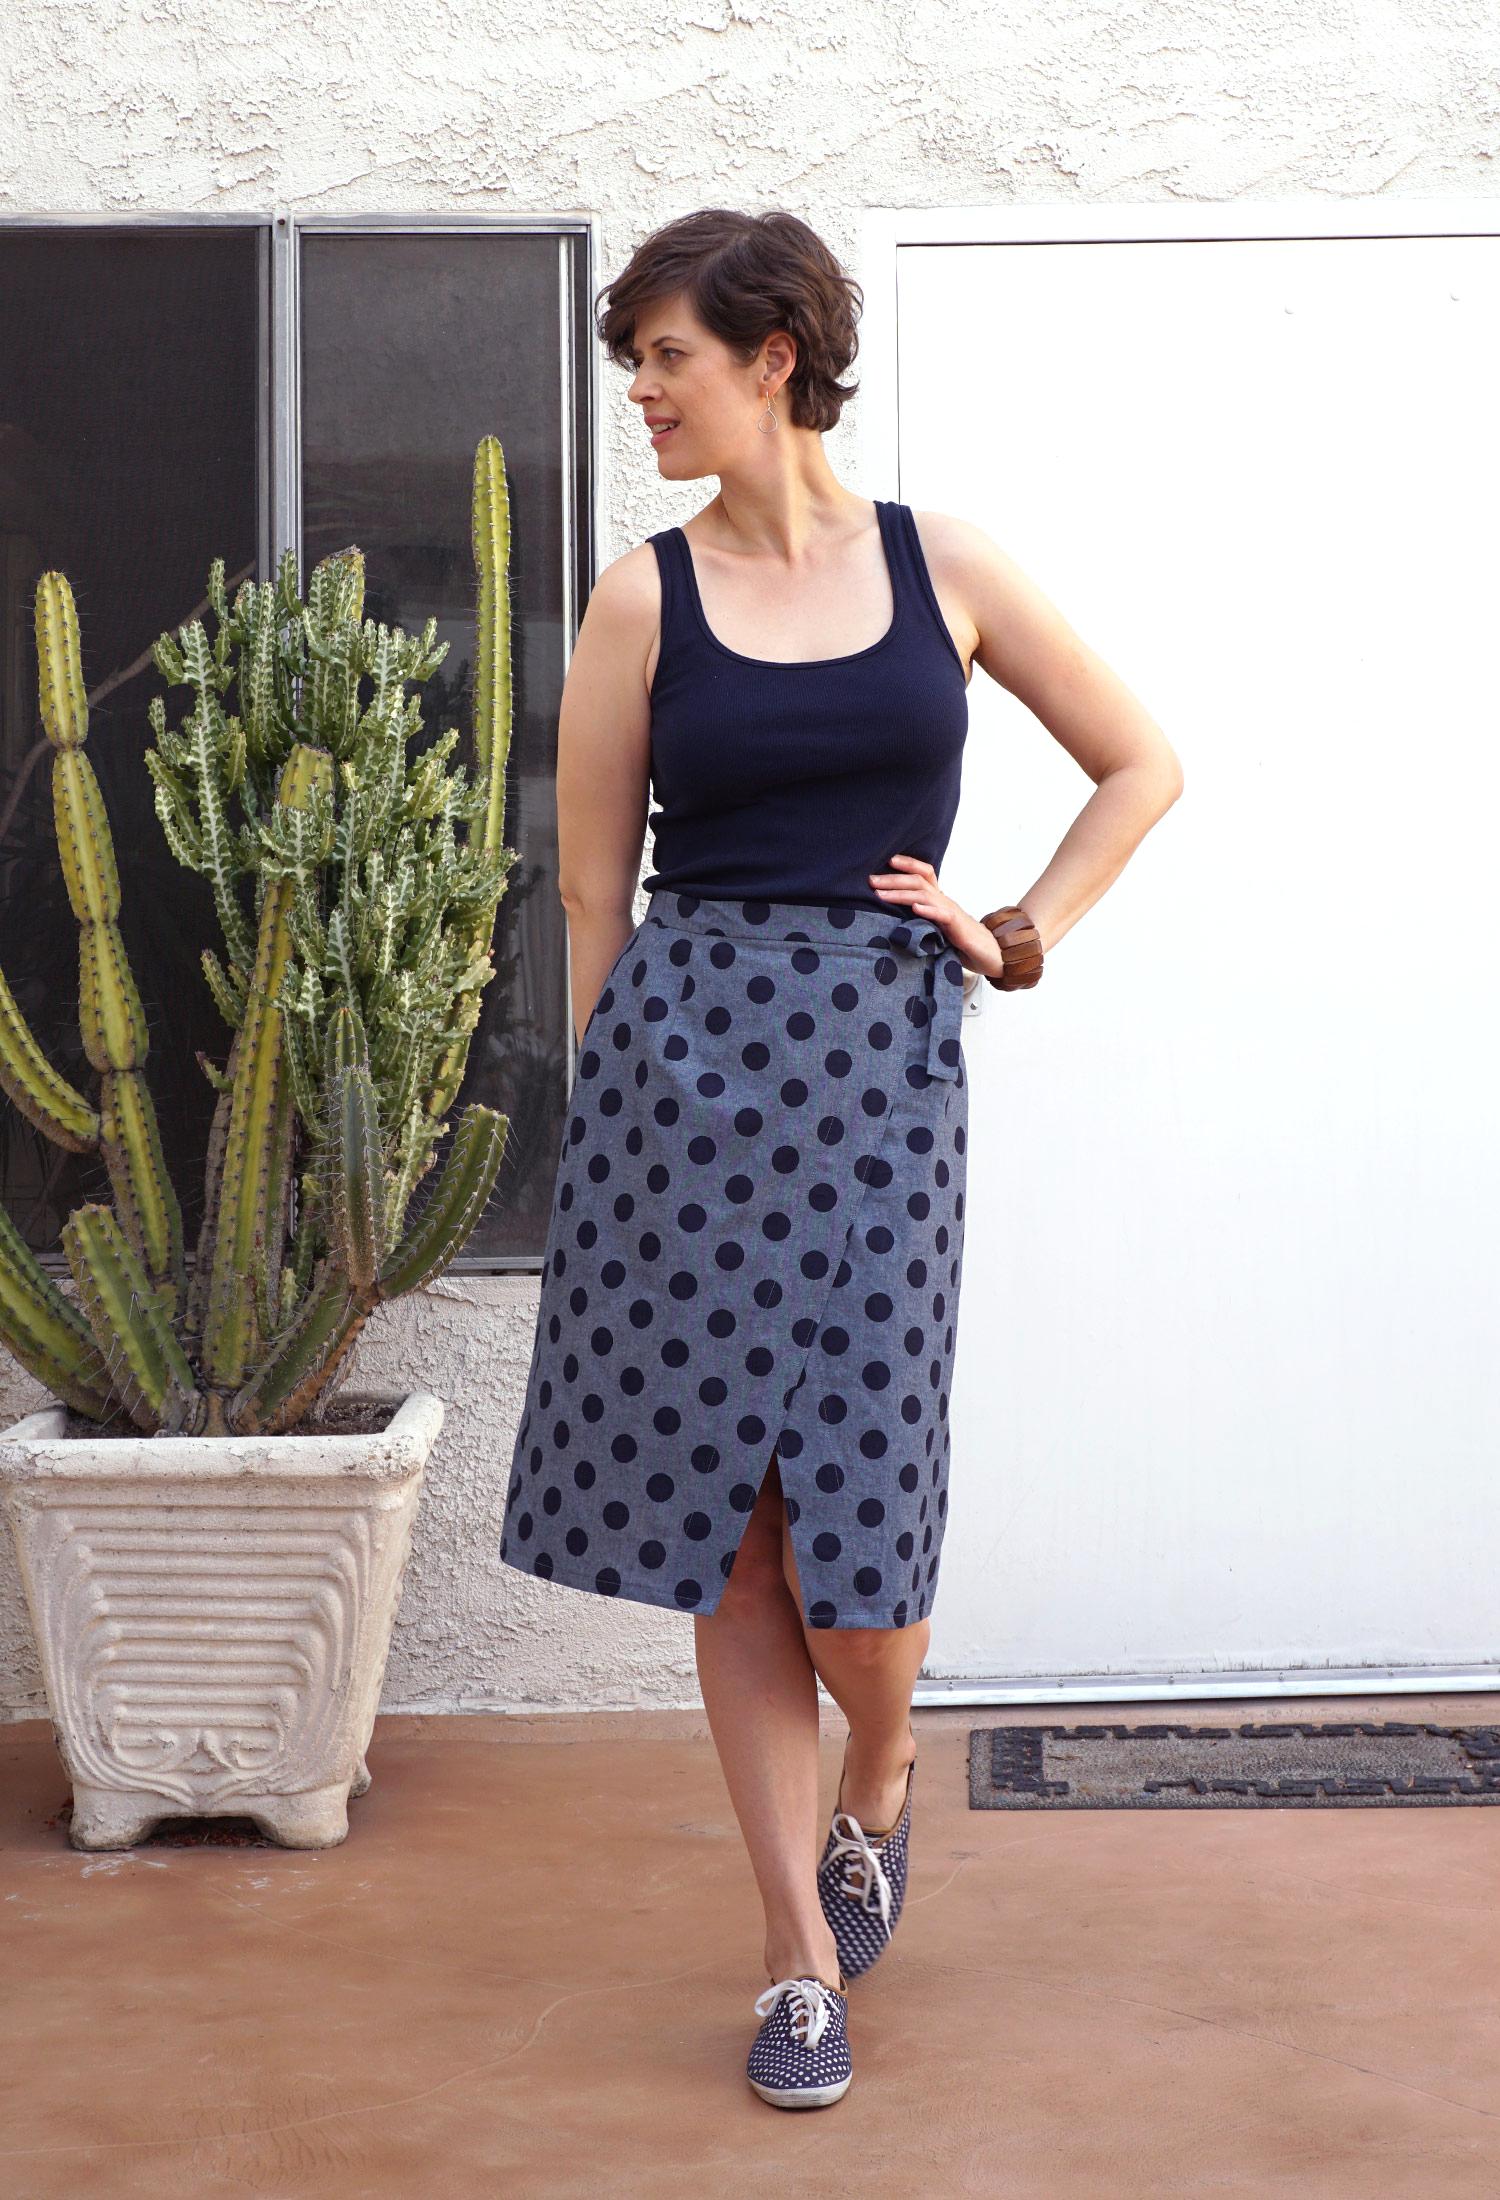 DIY Polka Dot Nita Wrap Skirt | Sew DIY